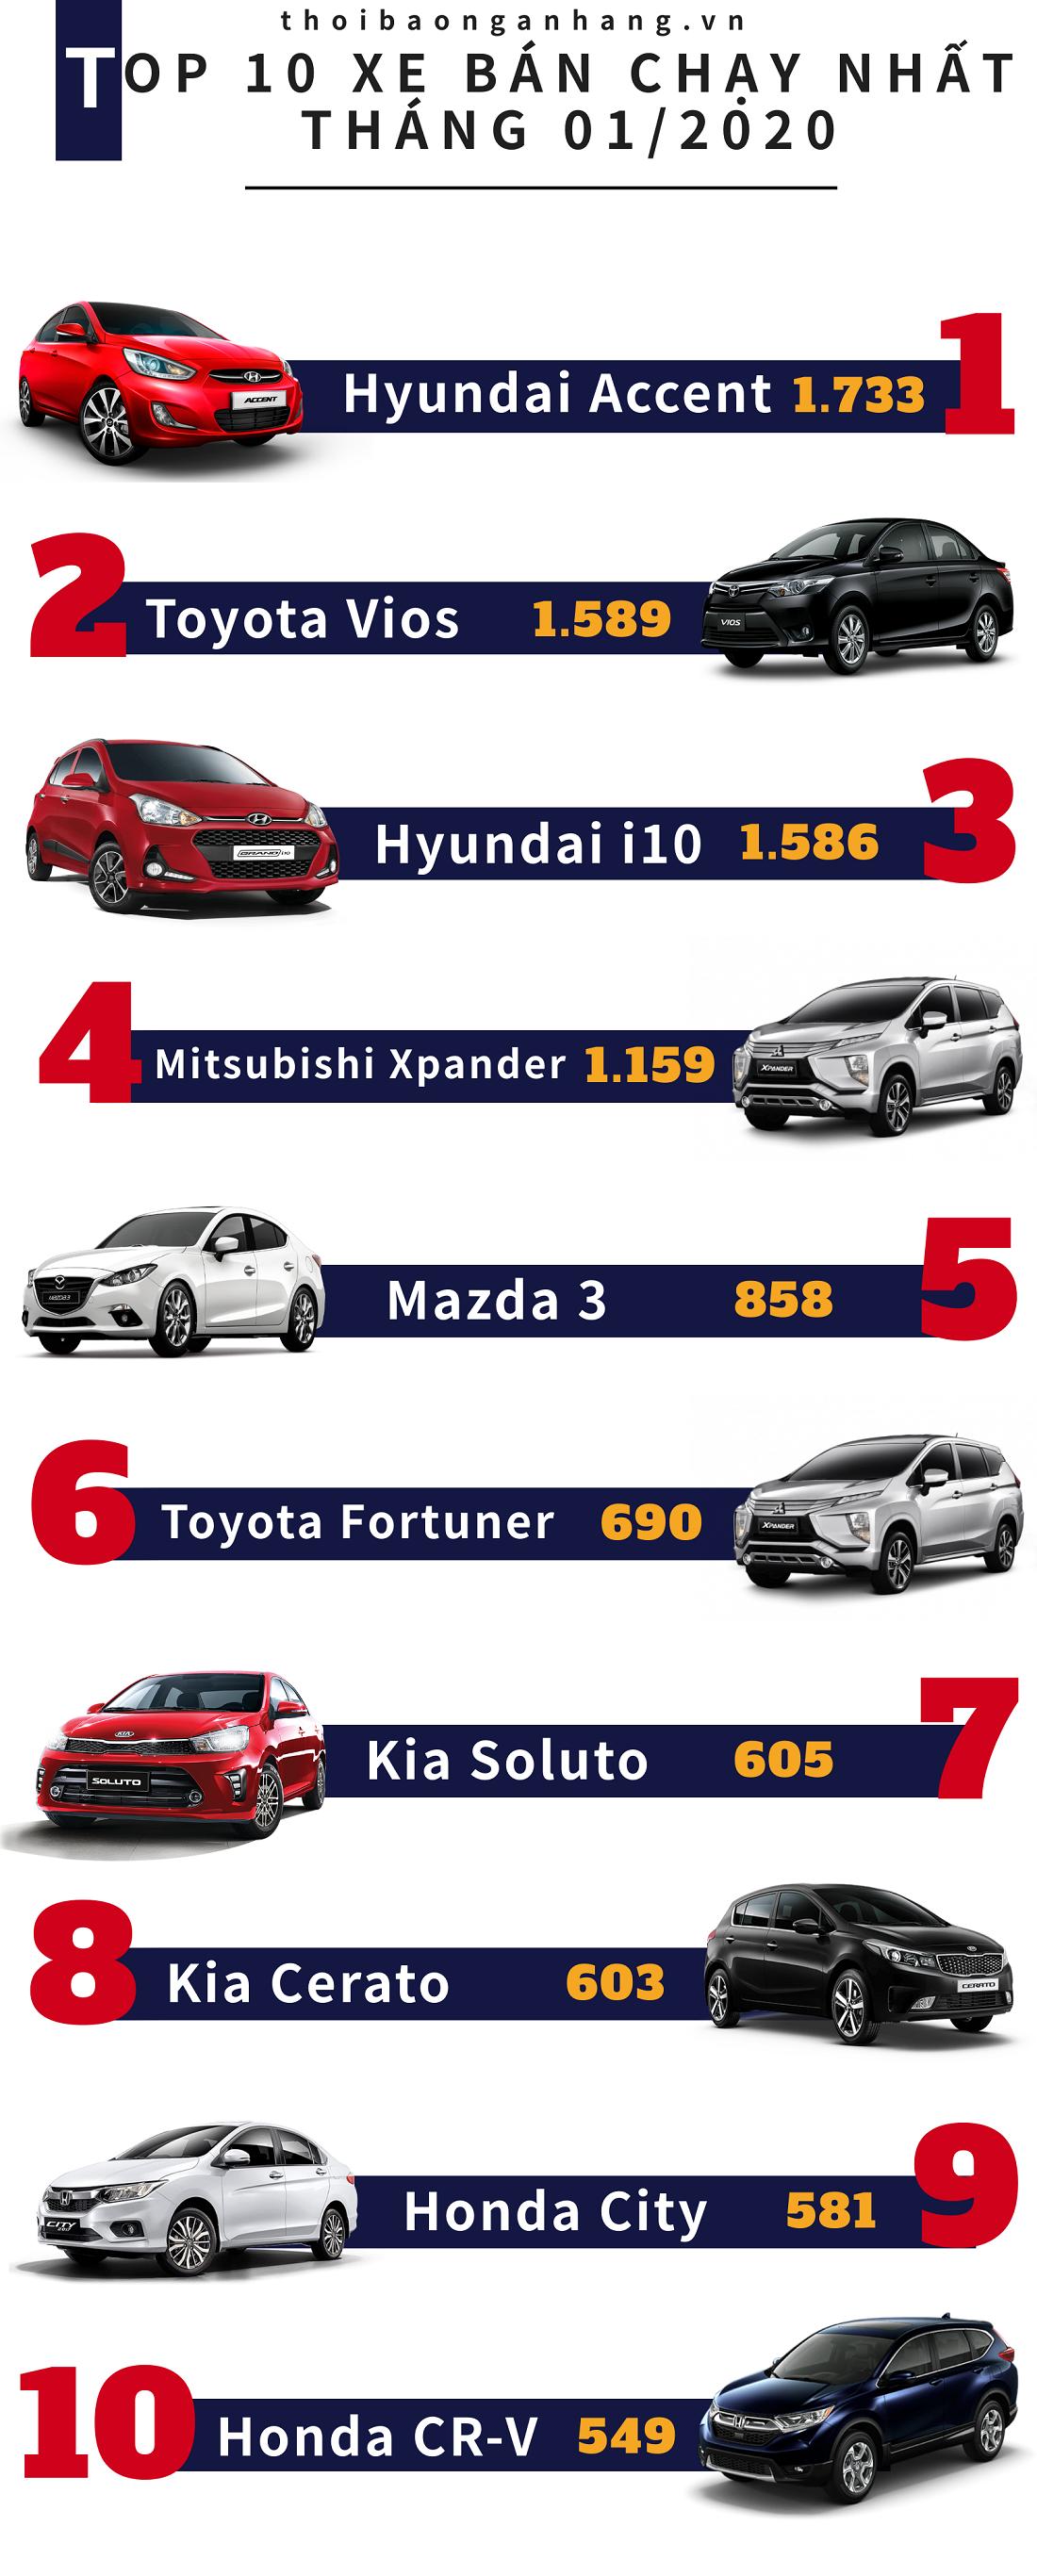 infographic top 10 xe ban chay nhat thi truong 012020 hyundai accent chiem ngoi vuong